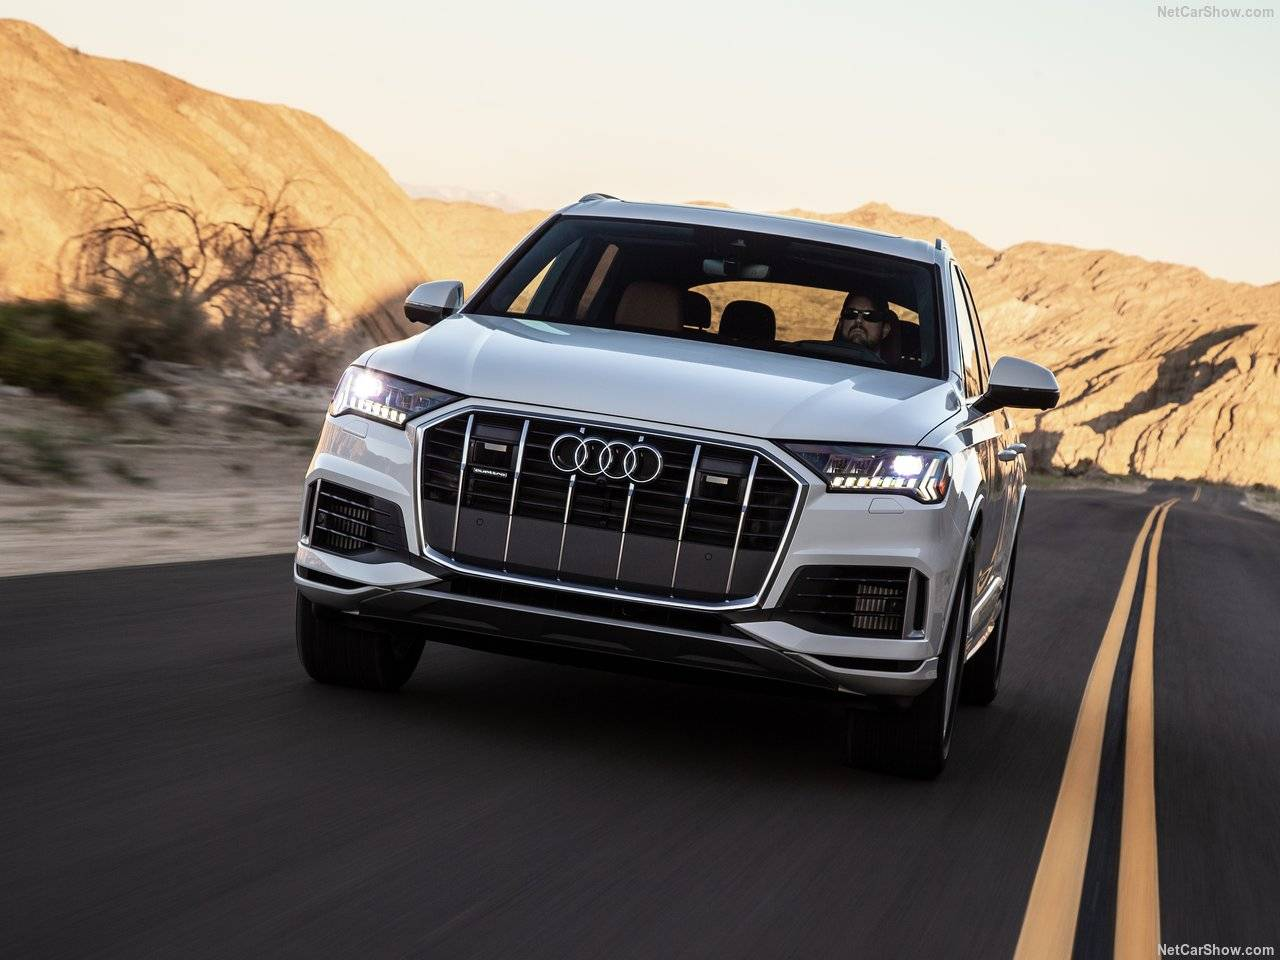 Audi-Q7-2020-1280-26.jpg